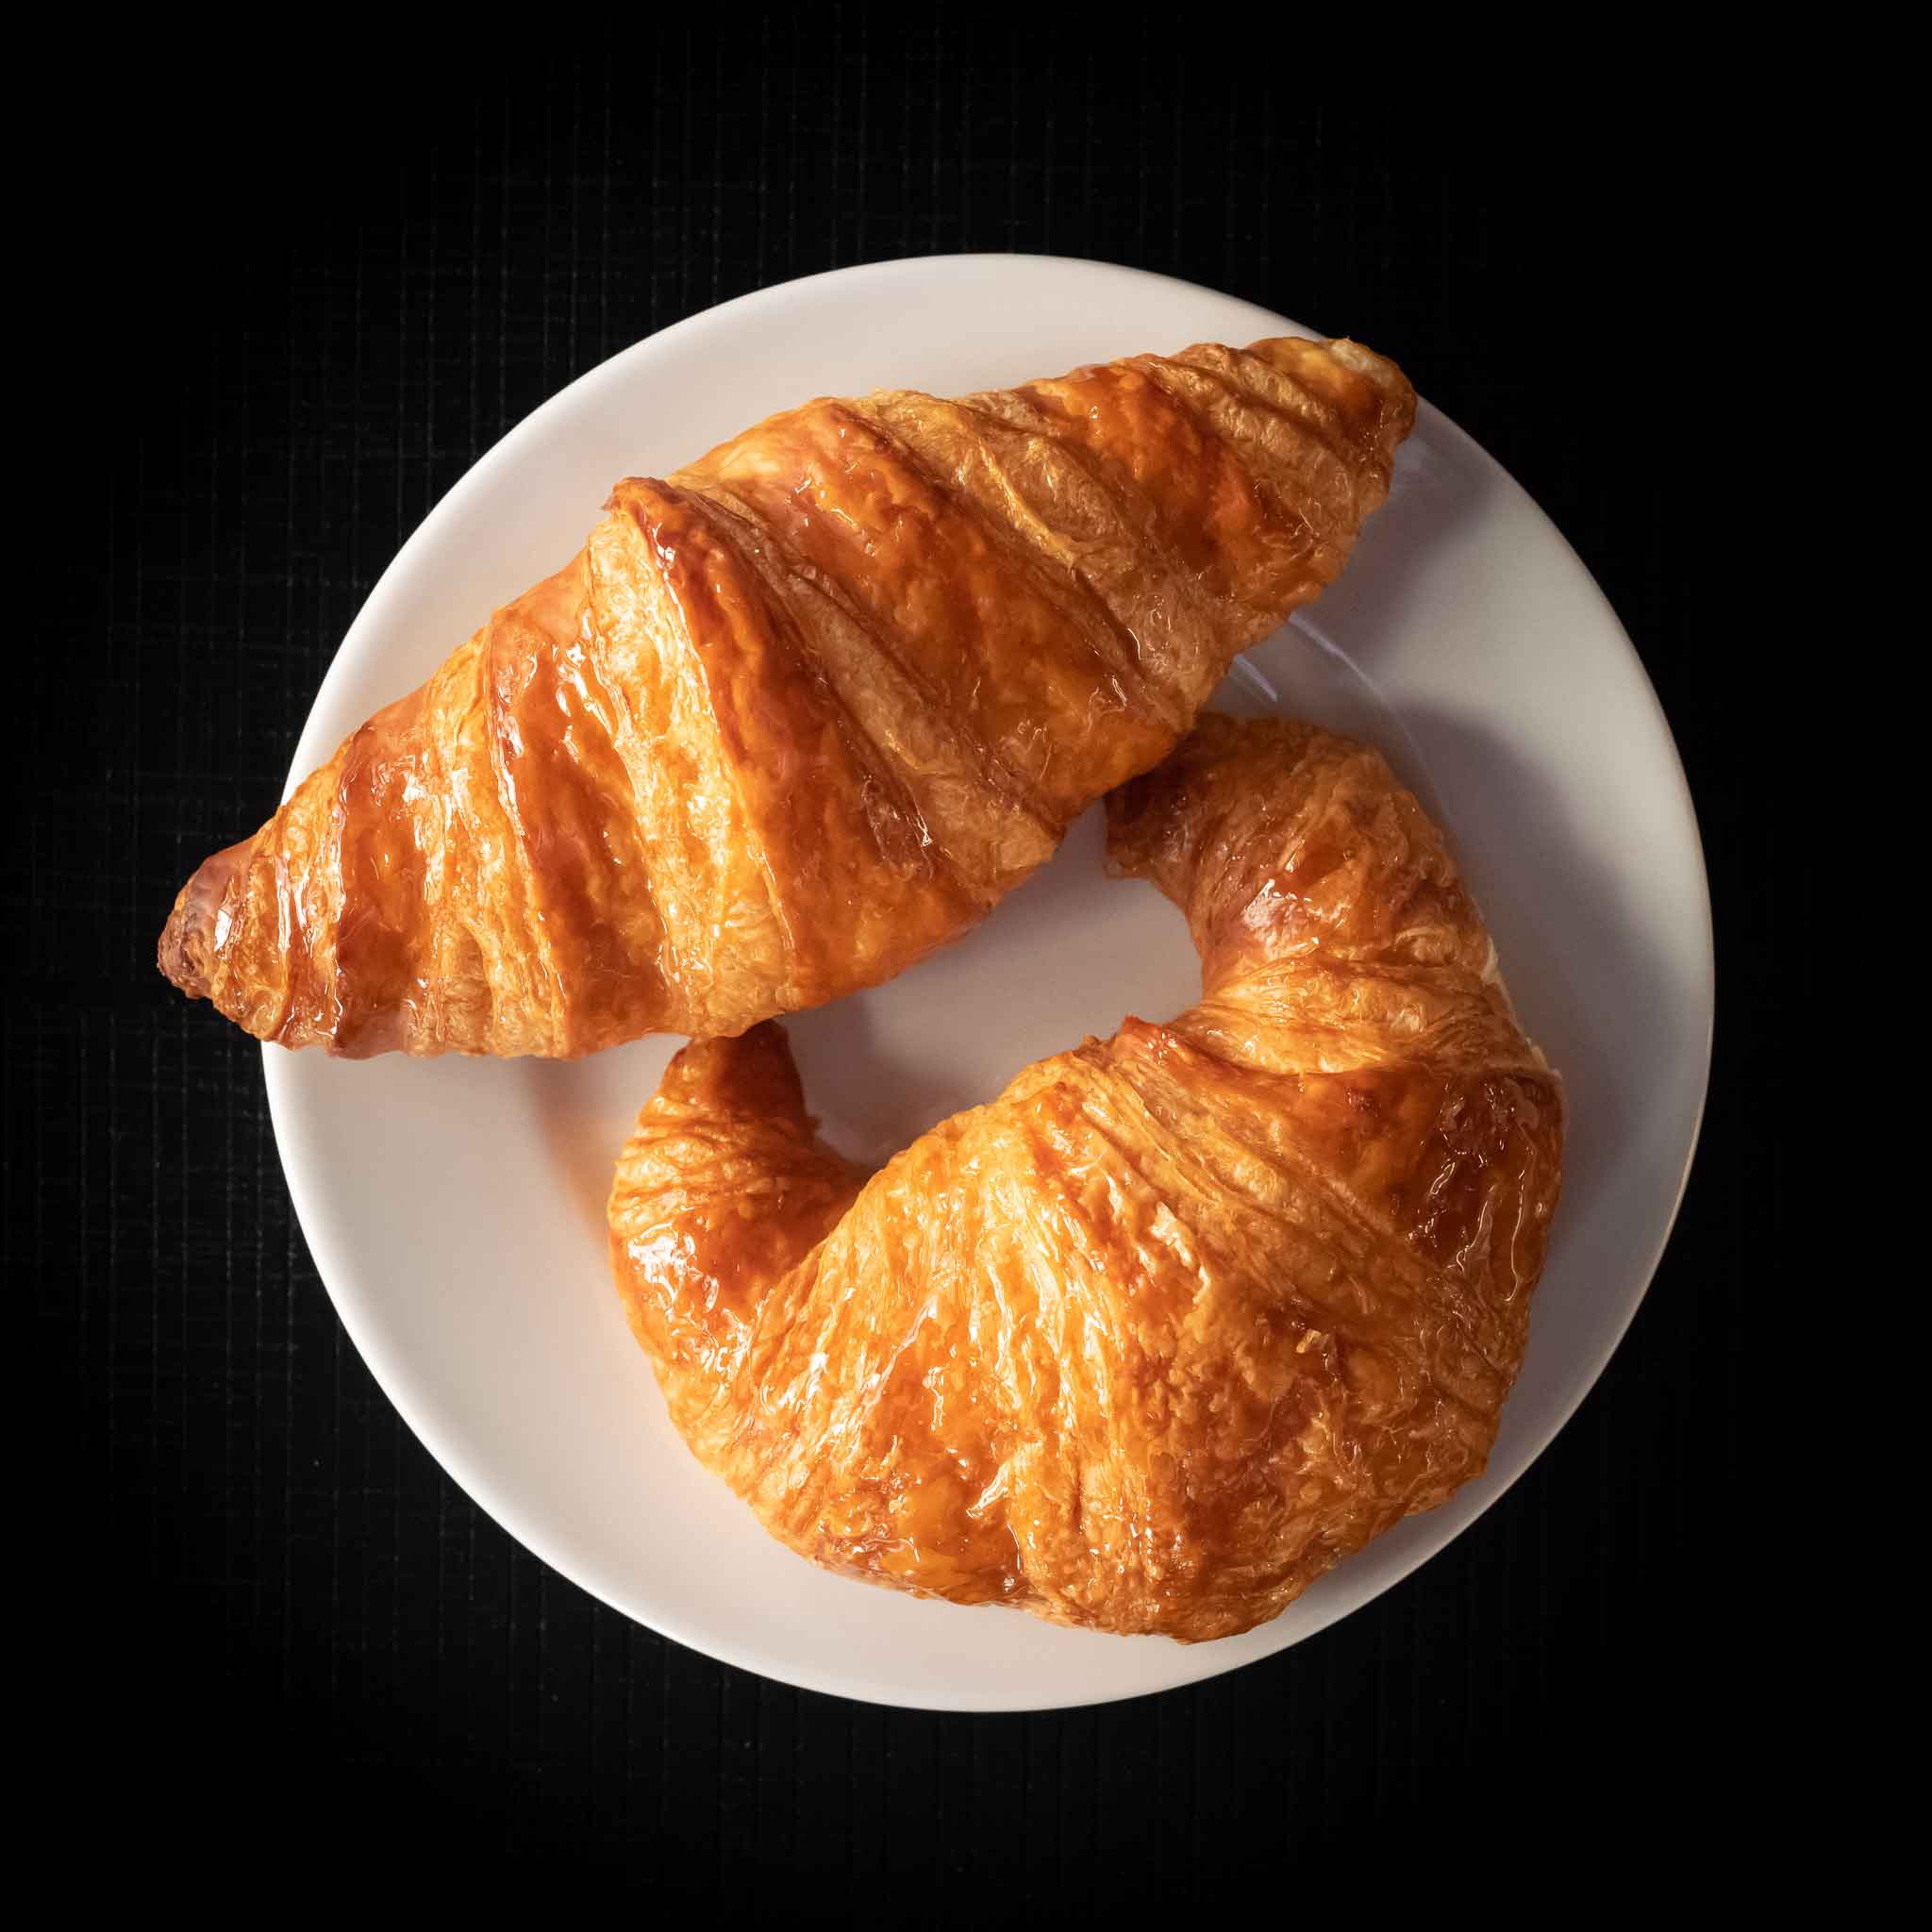 Milano le baguette e i croissant alla boulangerie galit in porta venezia - Diversi tipi di pane ...